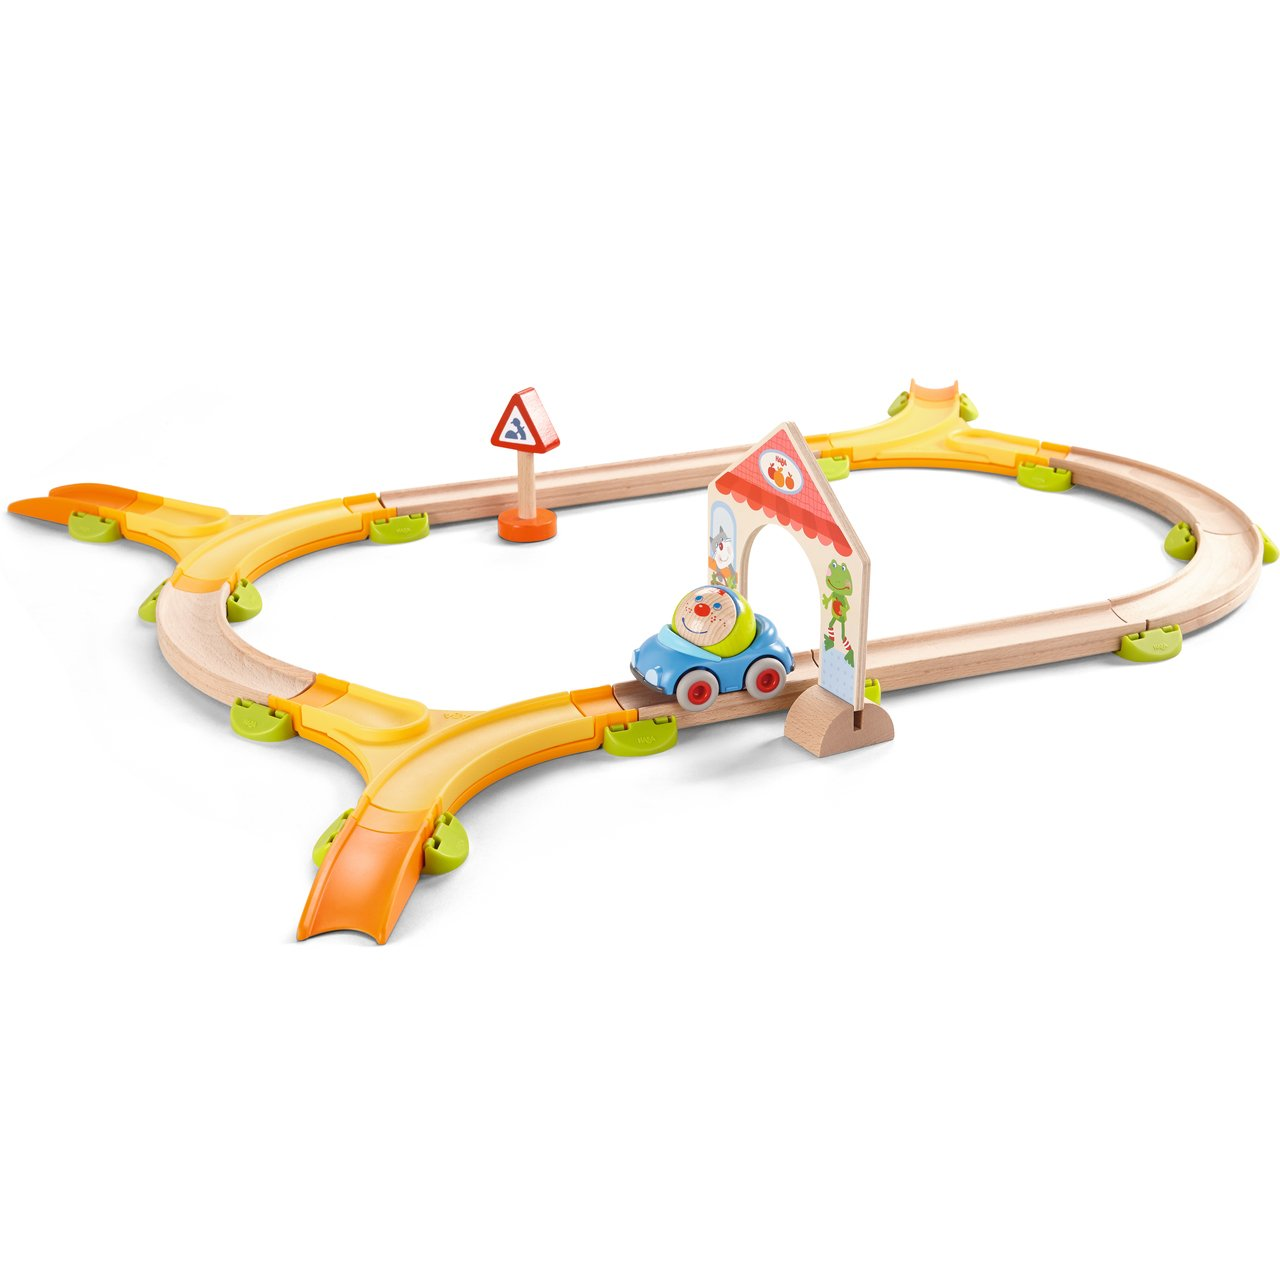 Haba Kullerbu Play Track Kringel Roundabout